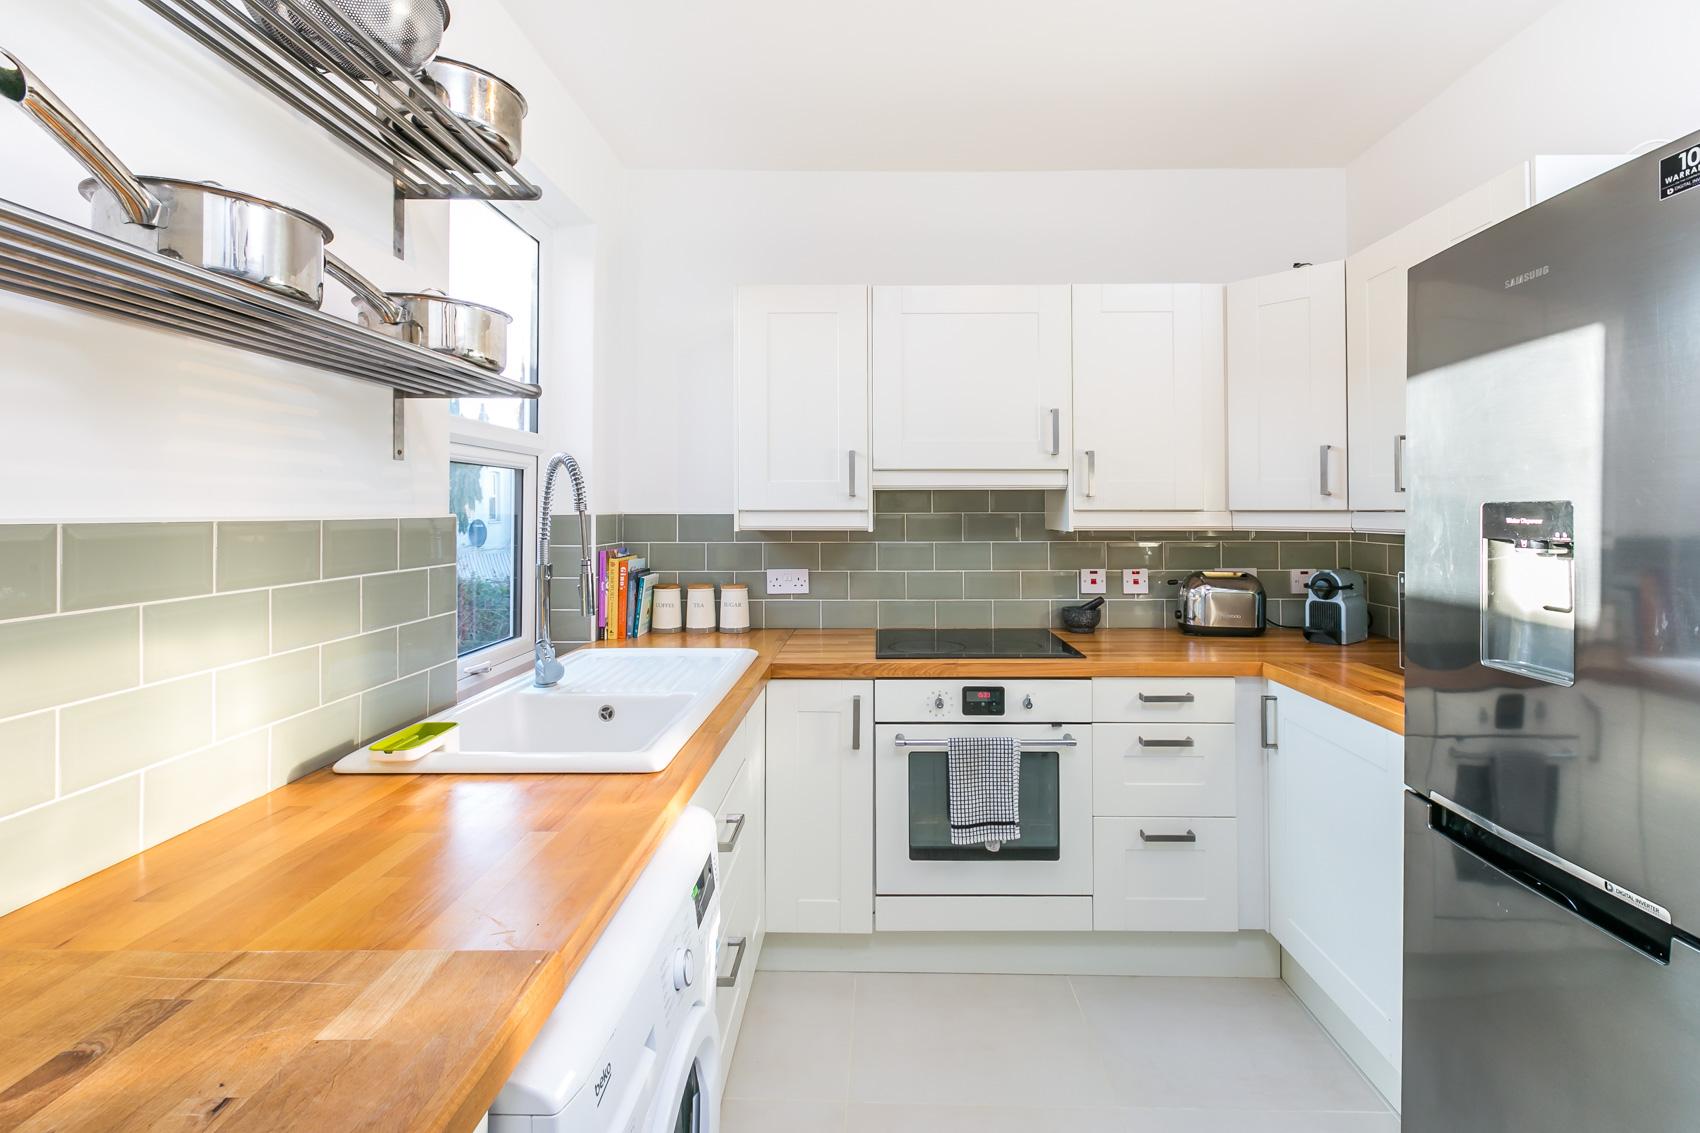 London Interior Kitchen Flat